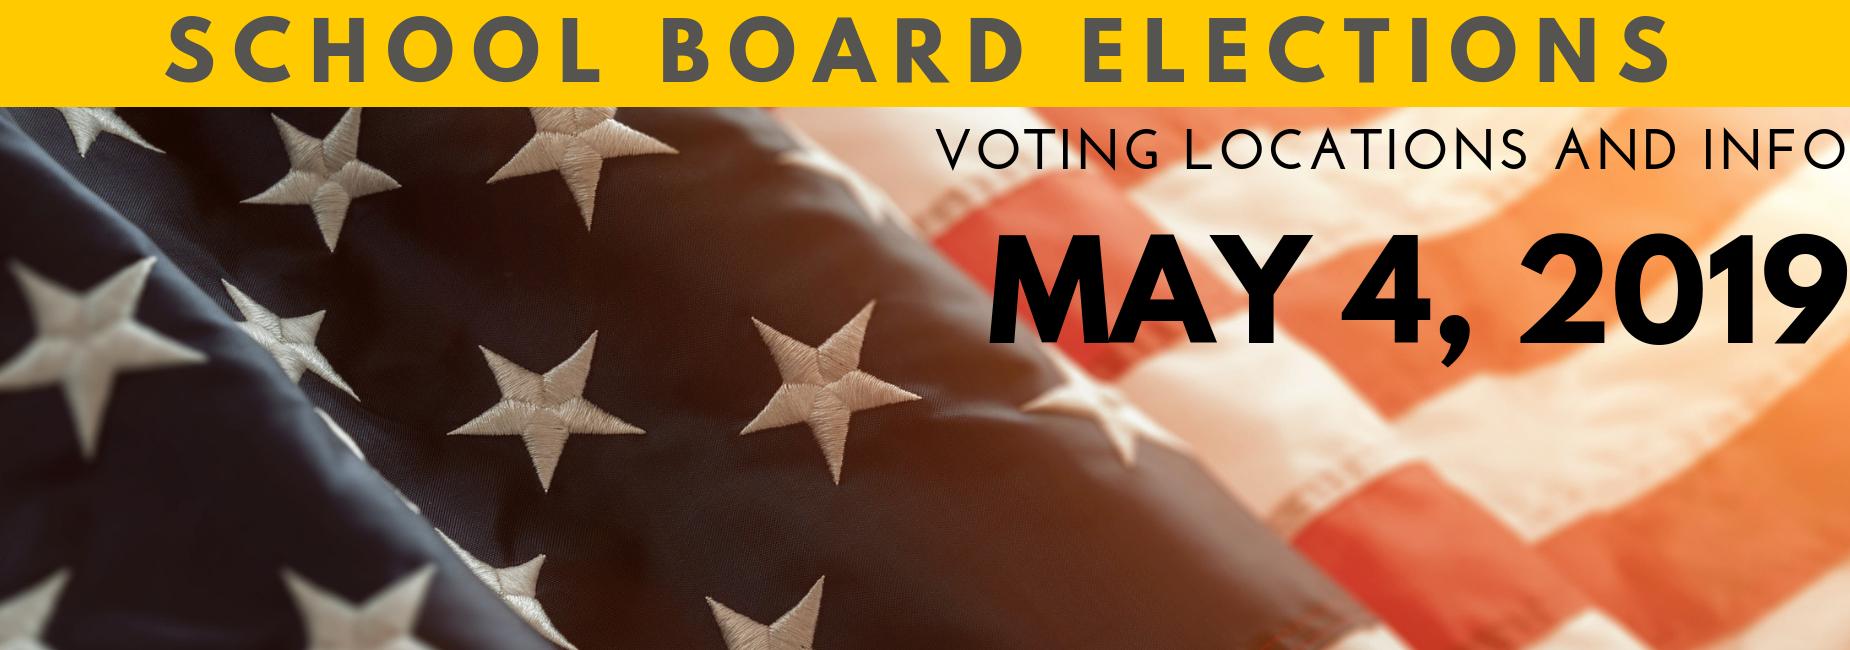 School Board Elections